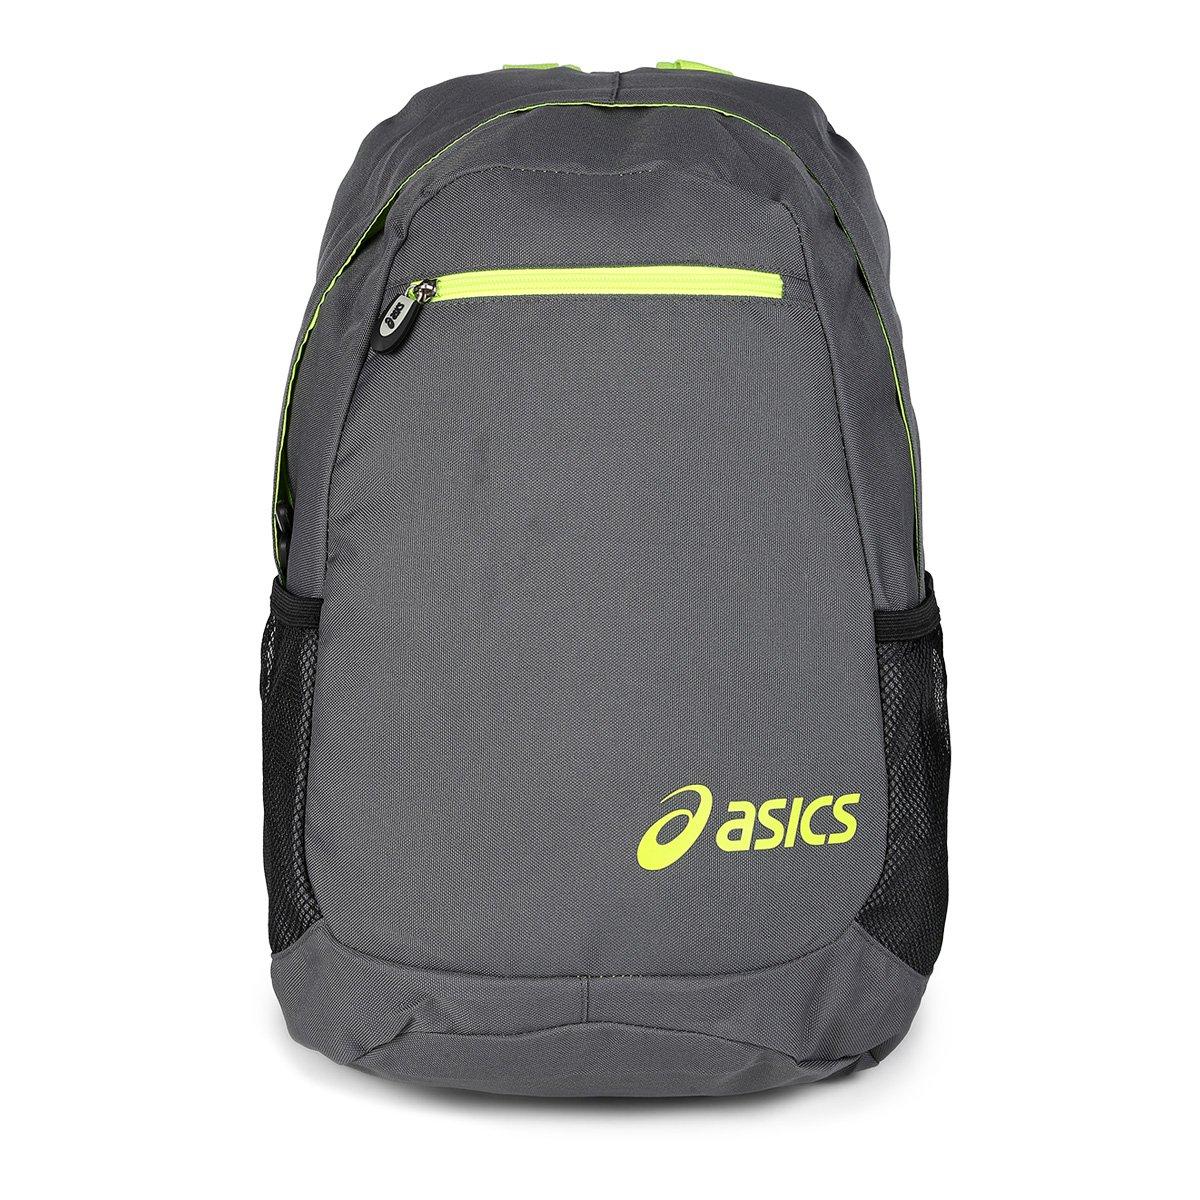 3abc5925d Mochila Asics Daily Backpack | Netshoes